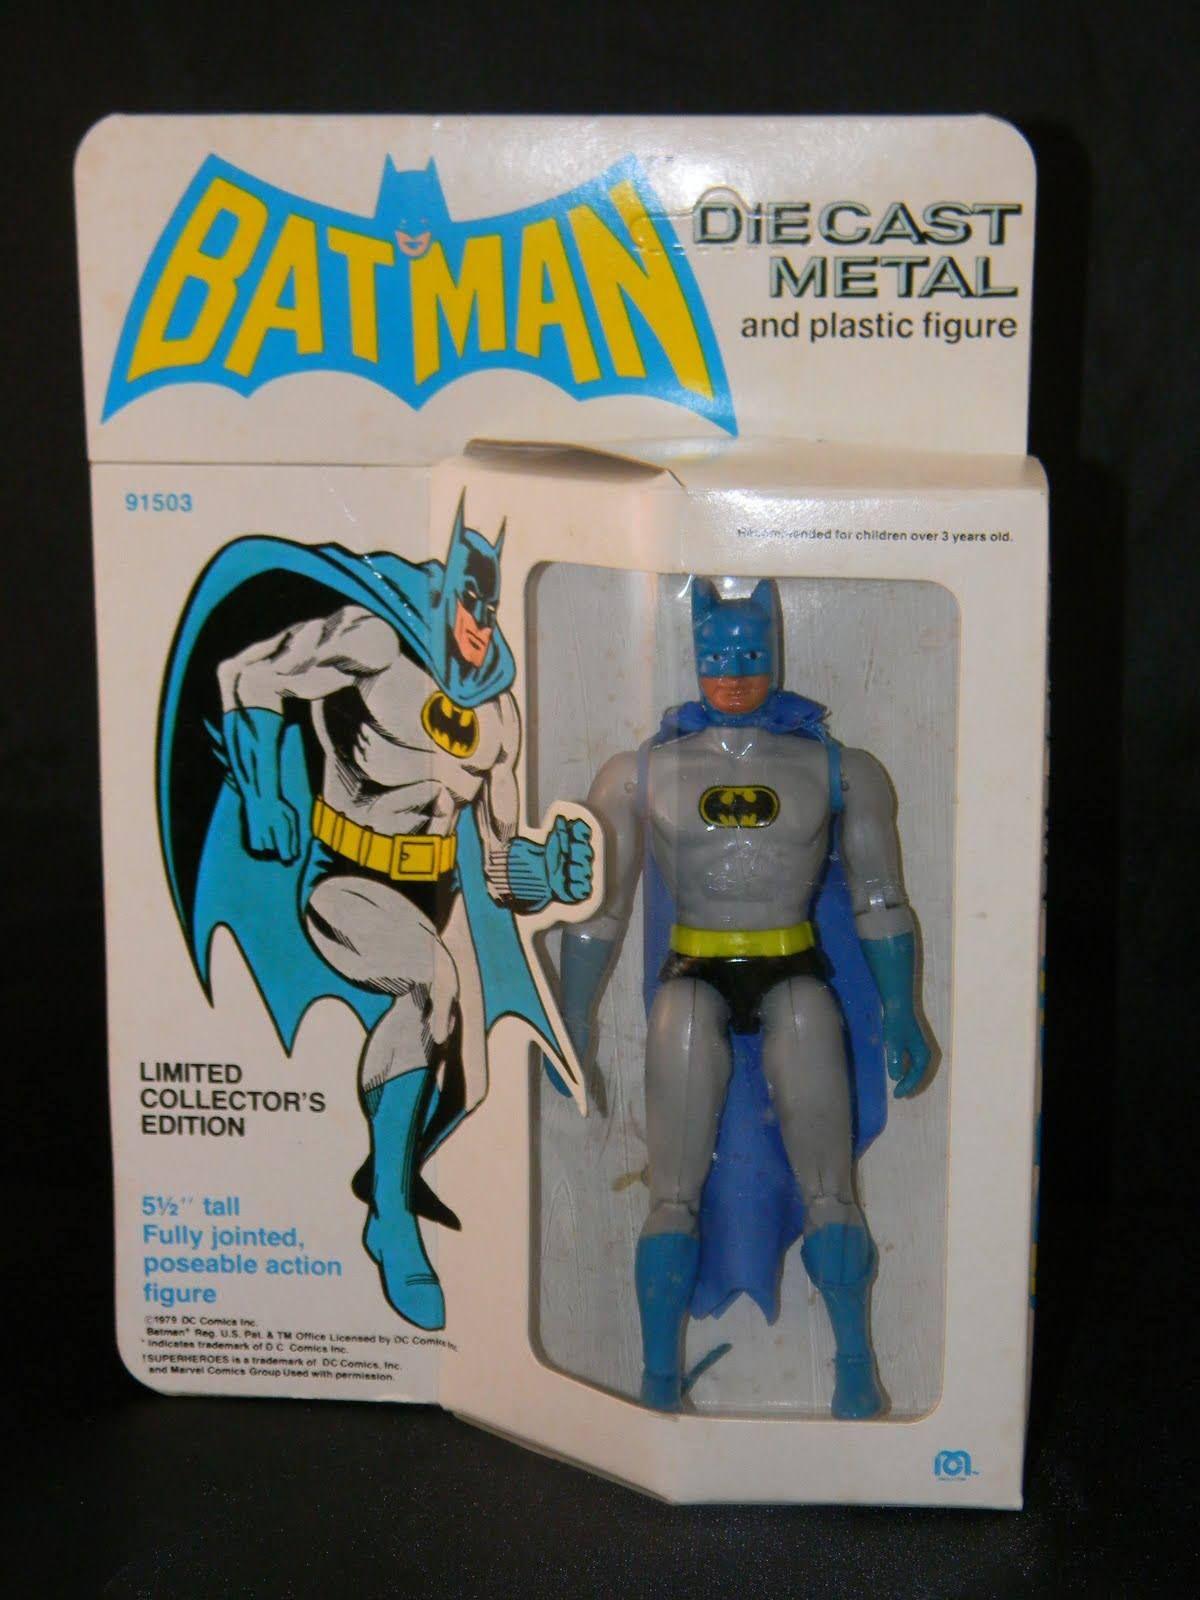 1979 Batman Die Cast Metal and plastic figure by Mego